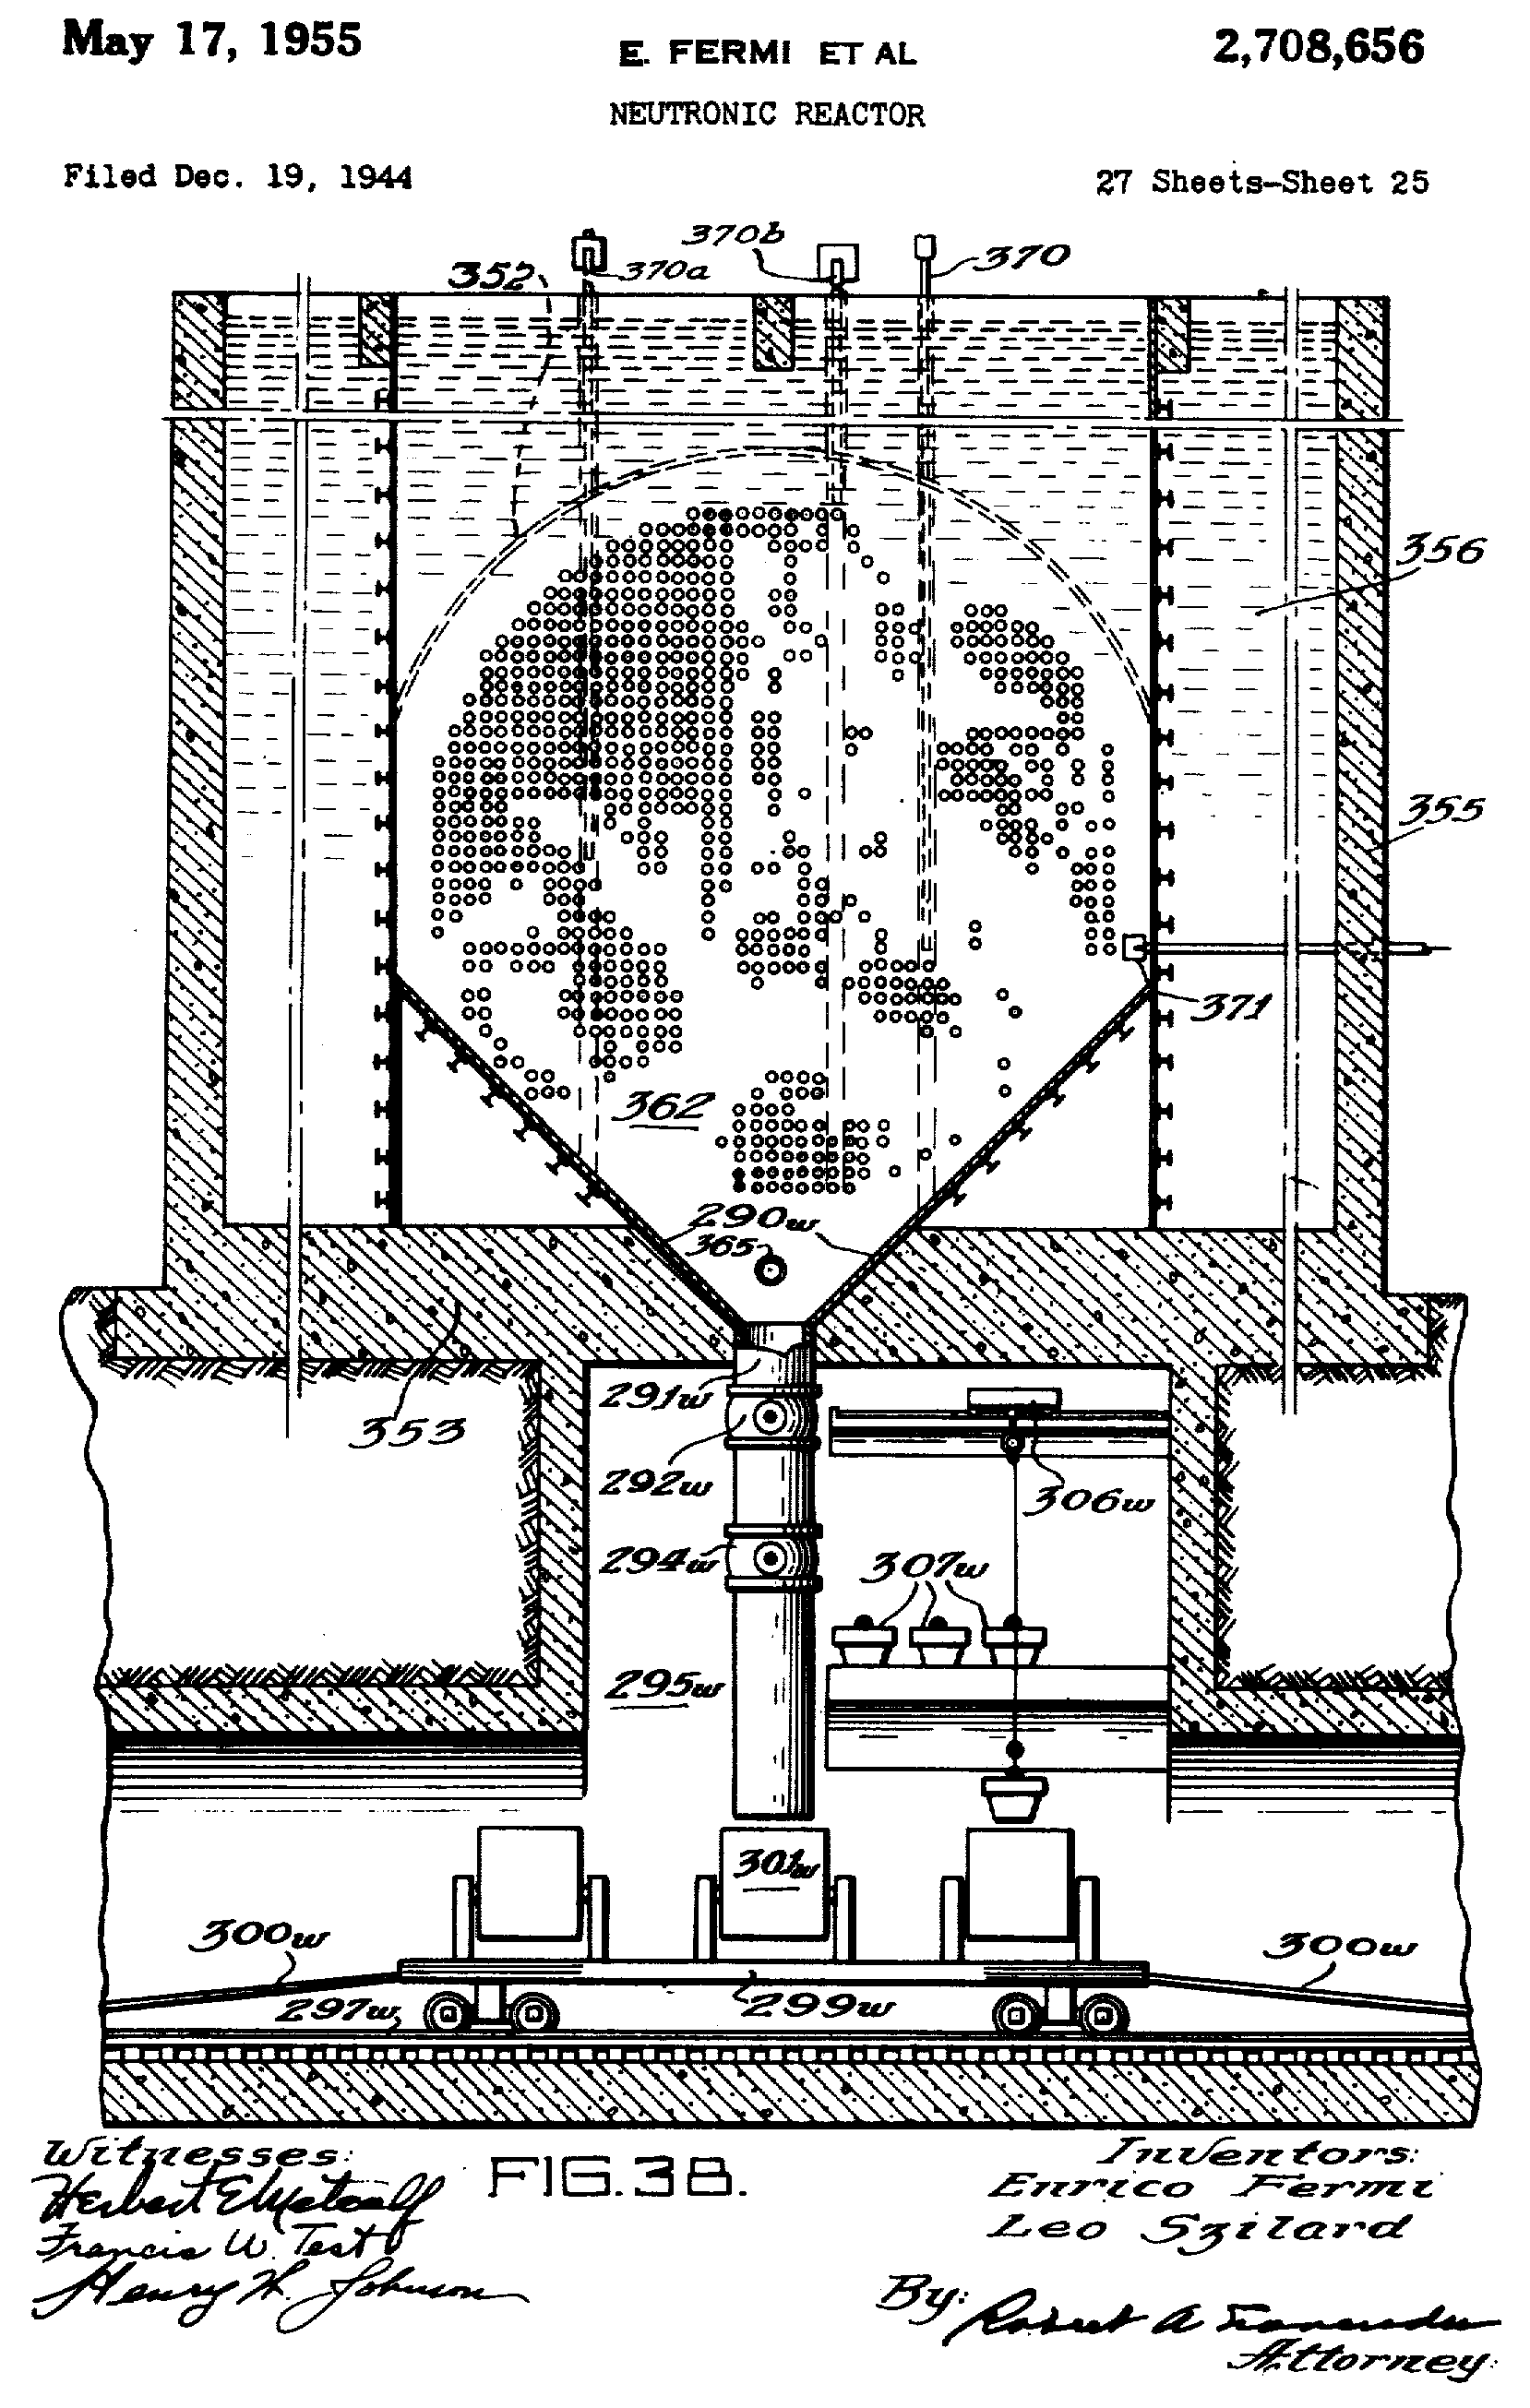 File Fermi Szilard Neutronic Reactor